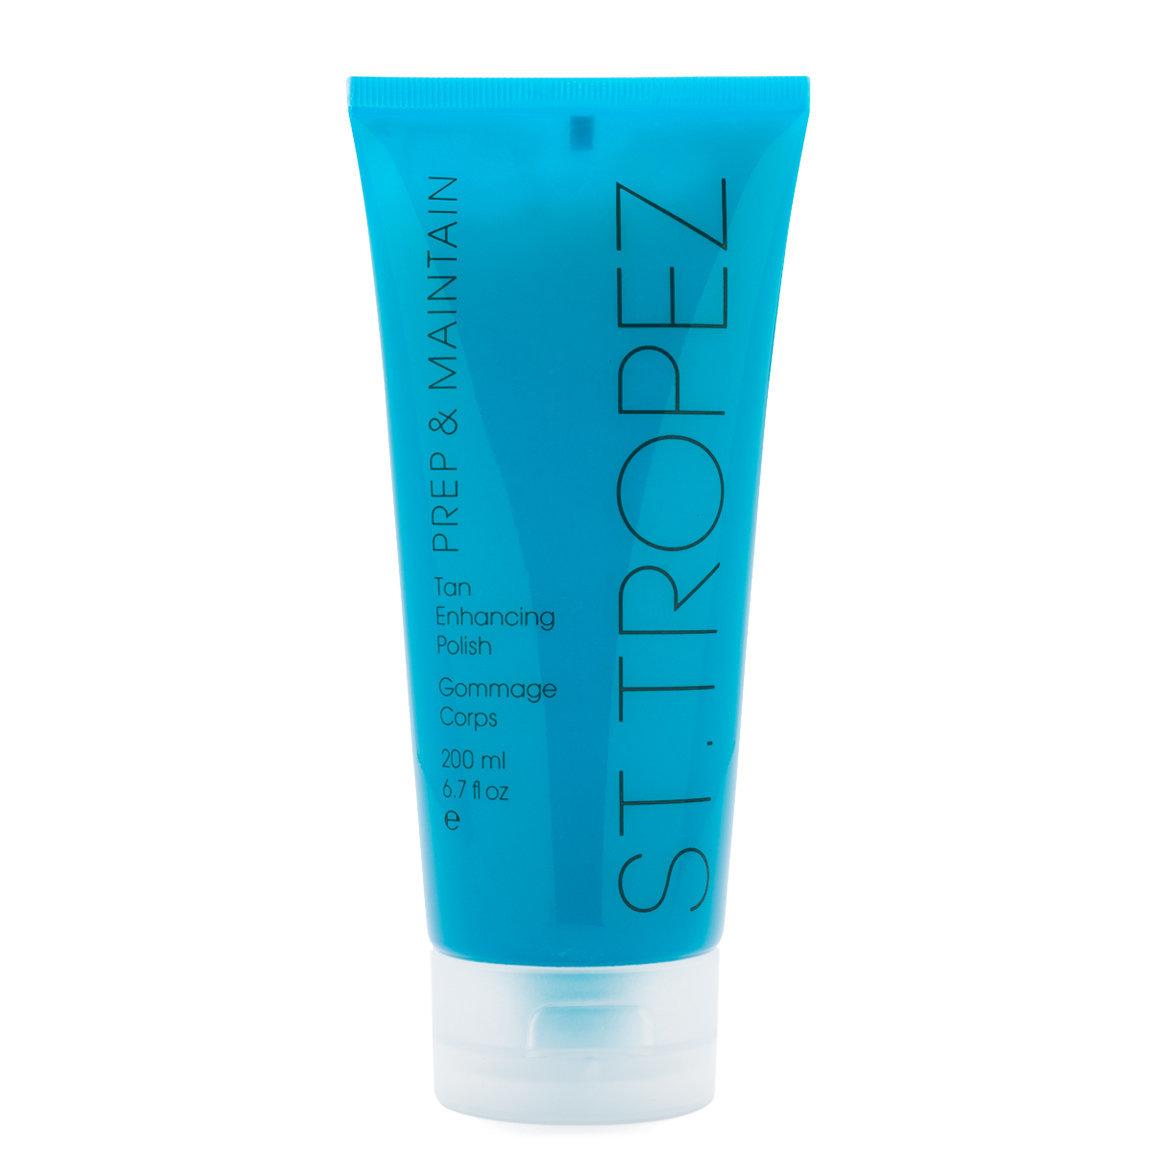 St. Tropez Tan Enhancing Body Polish alternative view 1 - product swatch.